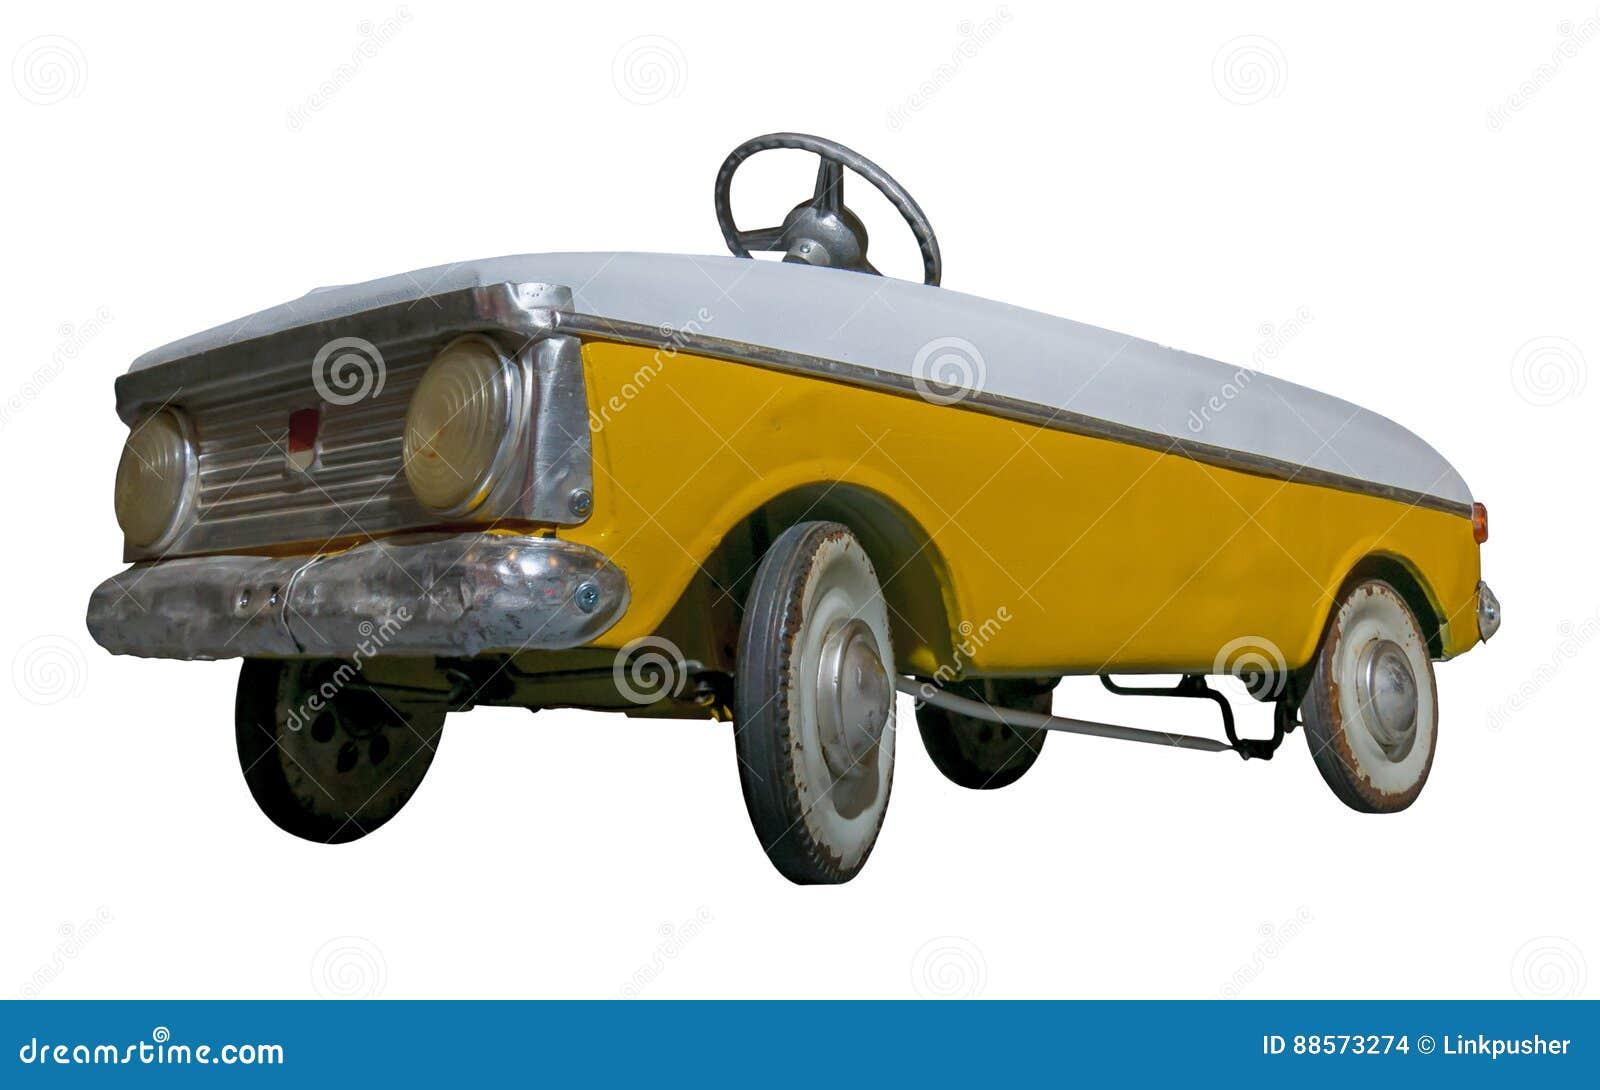 Coche teledirigido 80-197604 VTech Color Amarillo